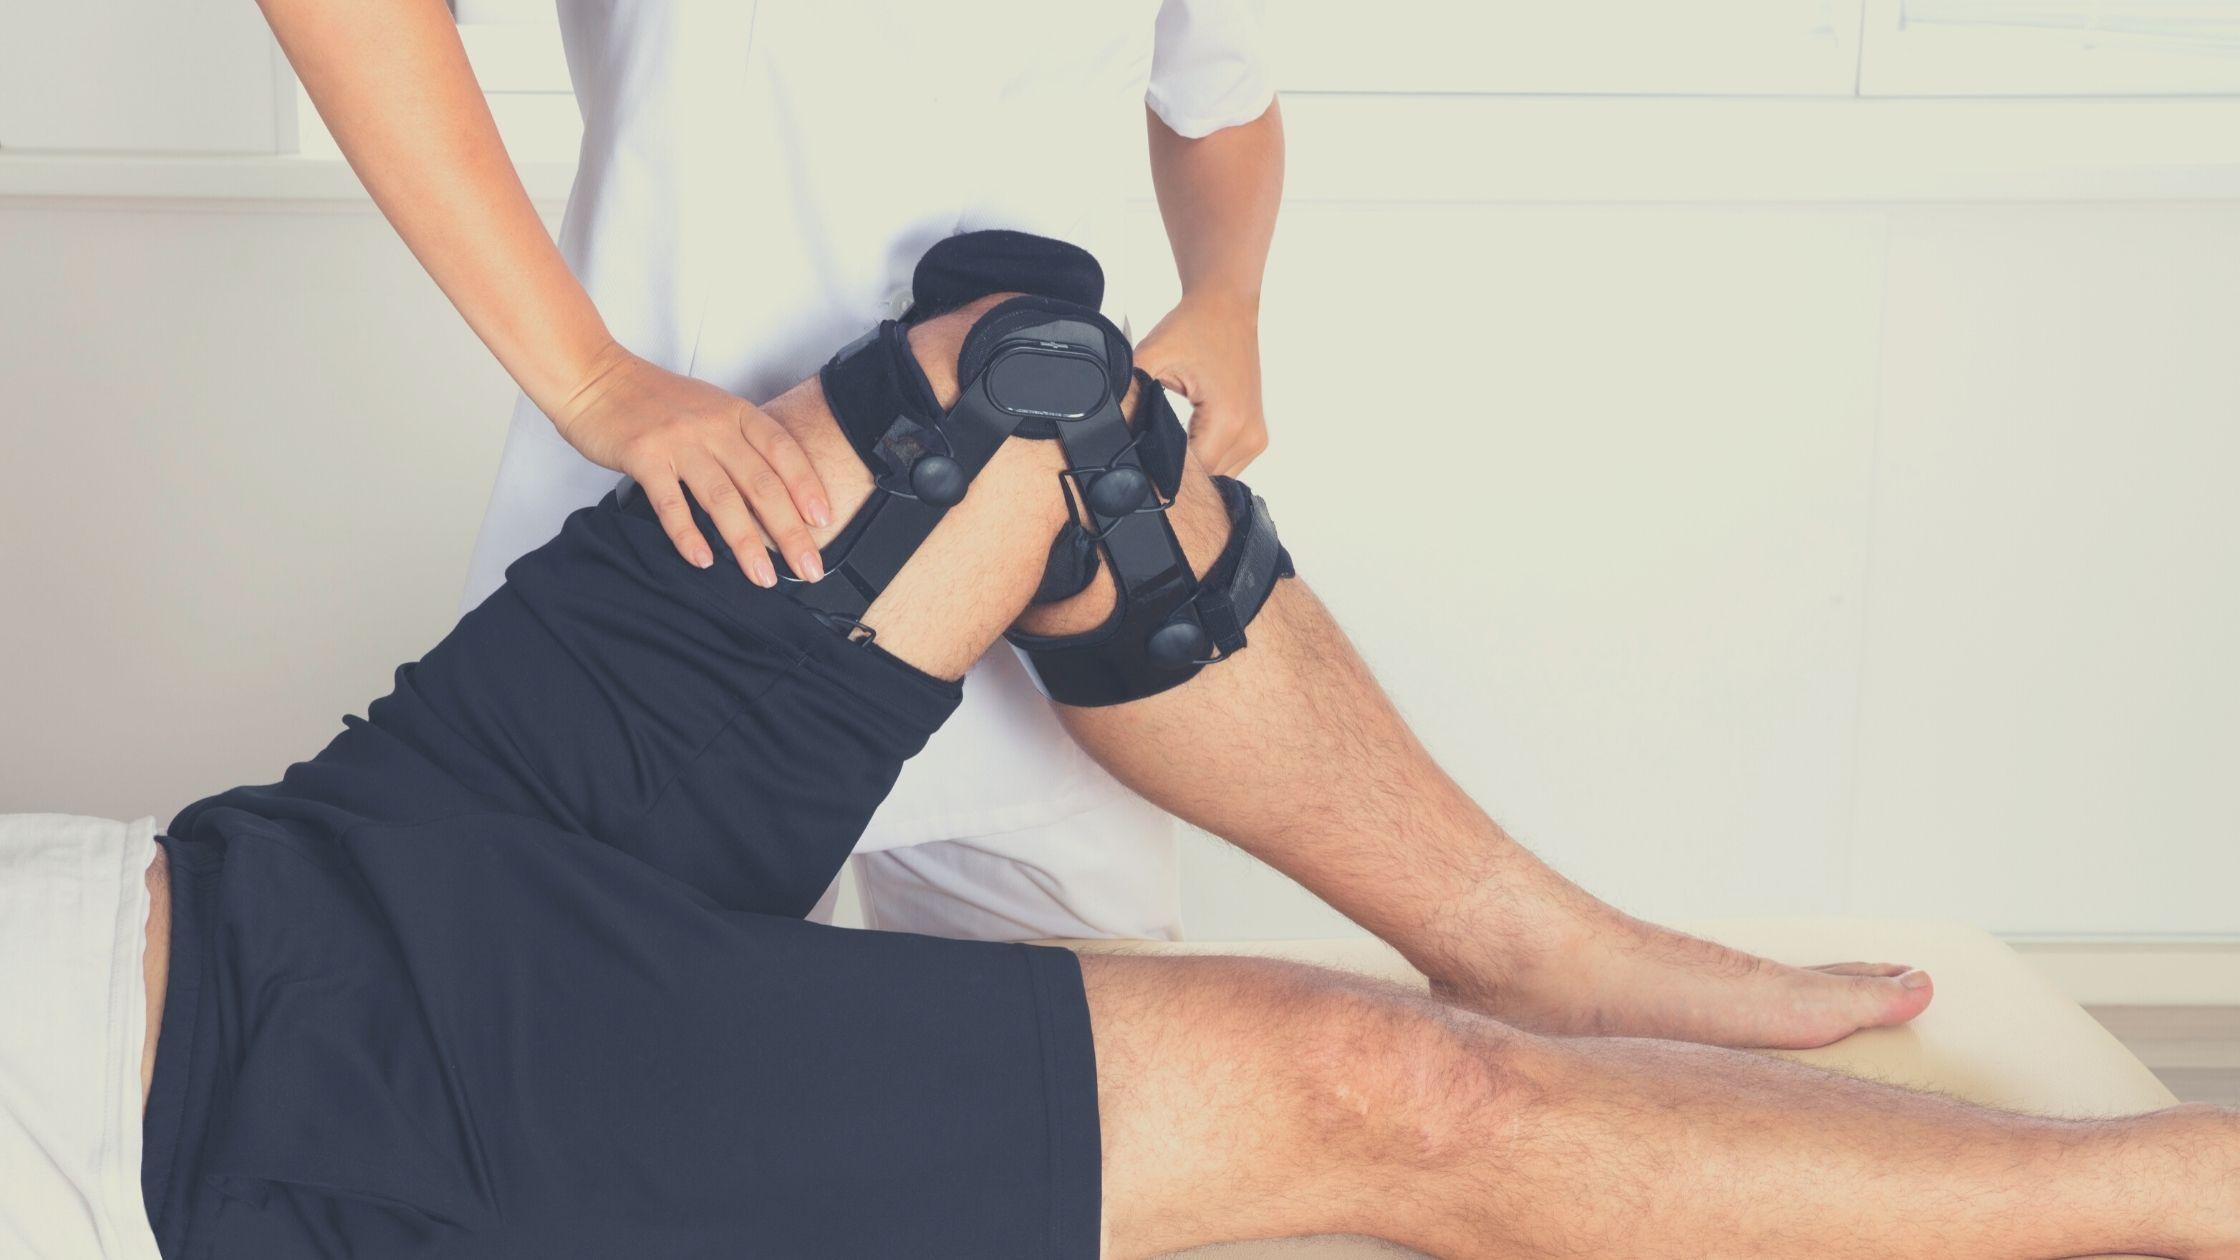 What Does An Osteoarthritis Knee Brace Do?